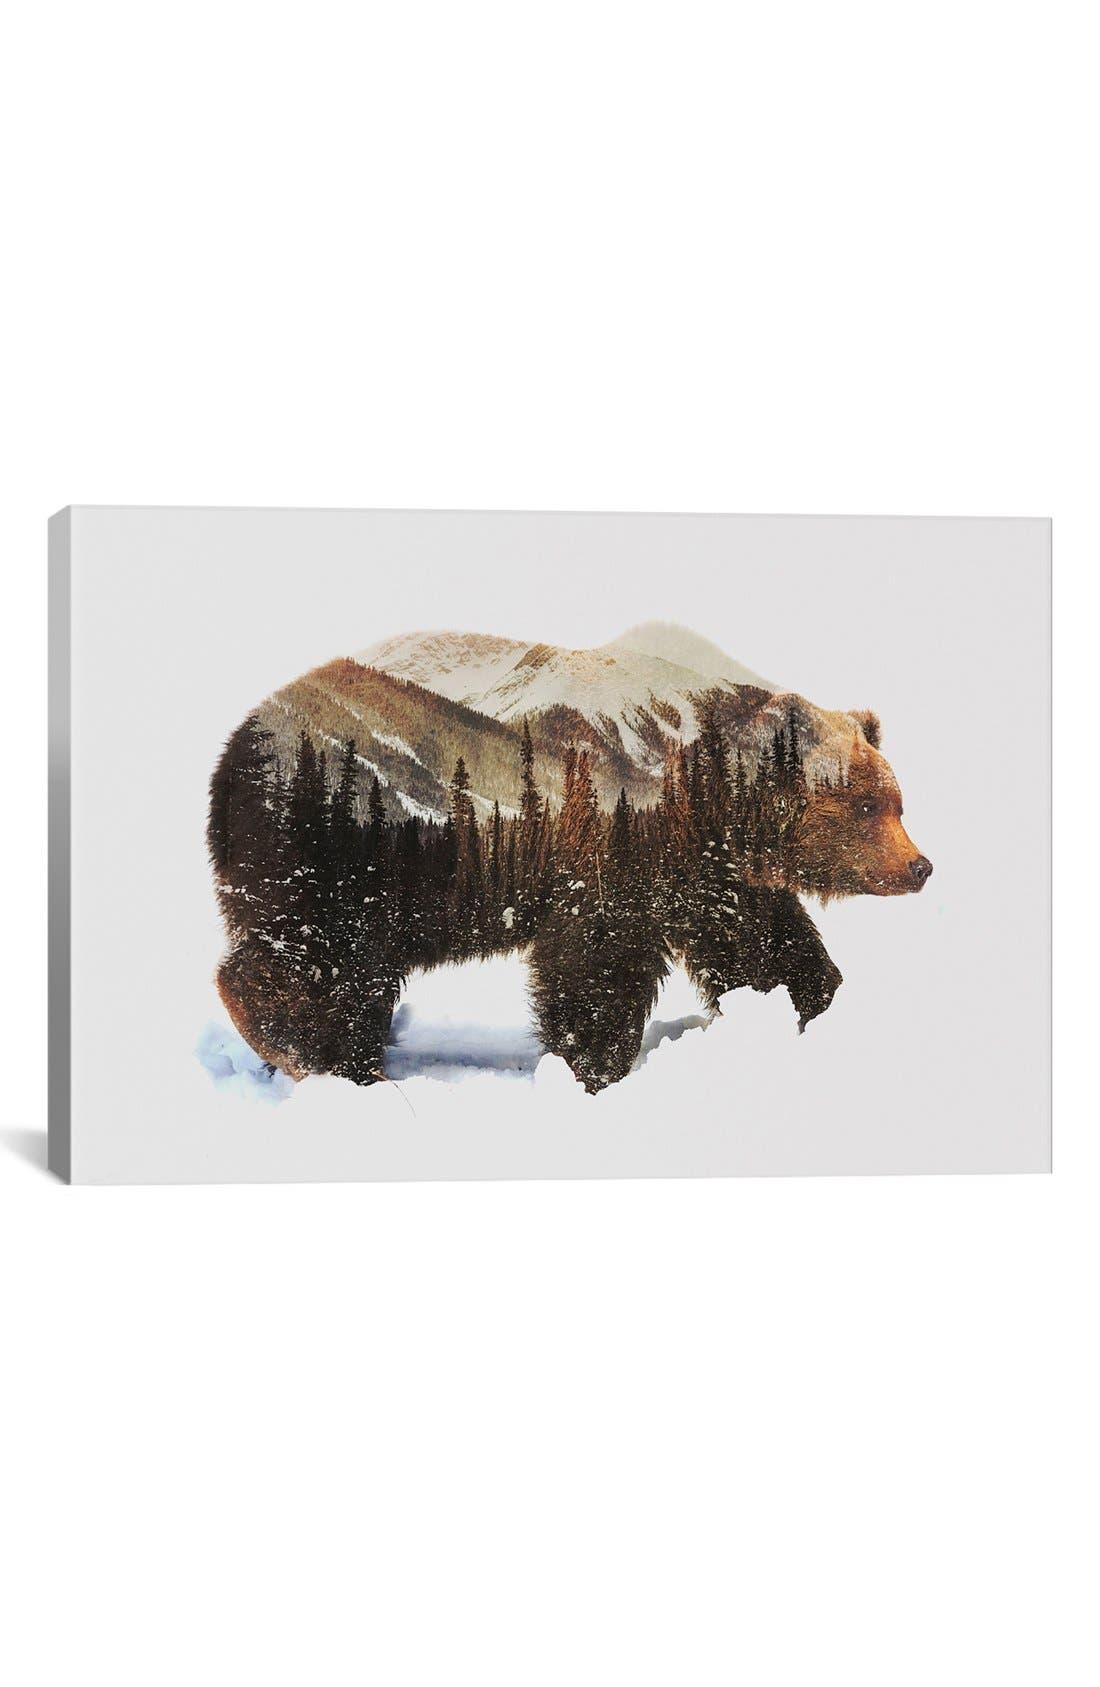 Alternate Image 1 Selected - iCanvas 'Grizzly Bear' Giclée Print Canvas Art